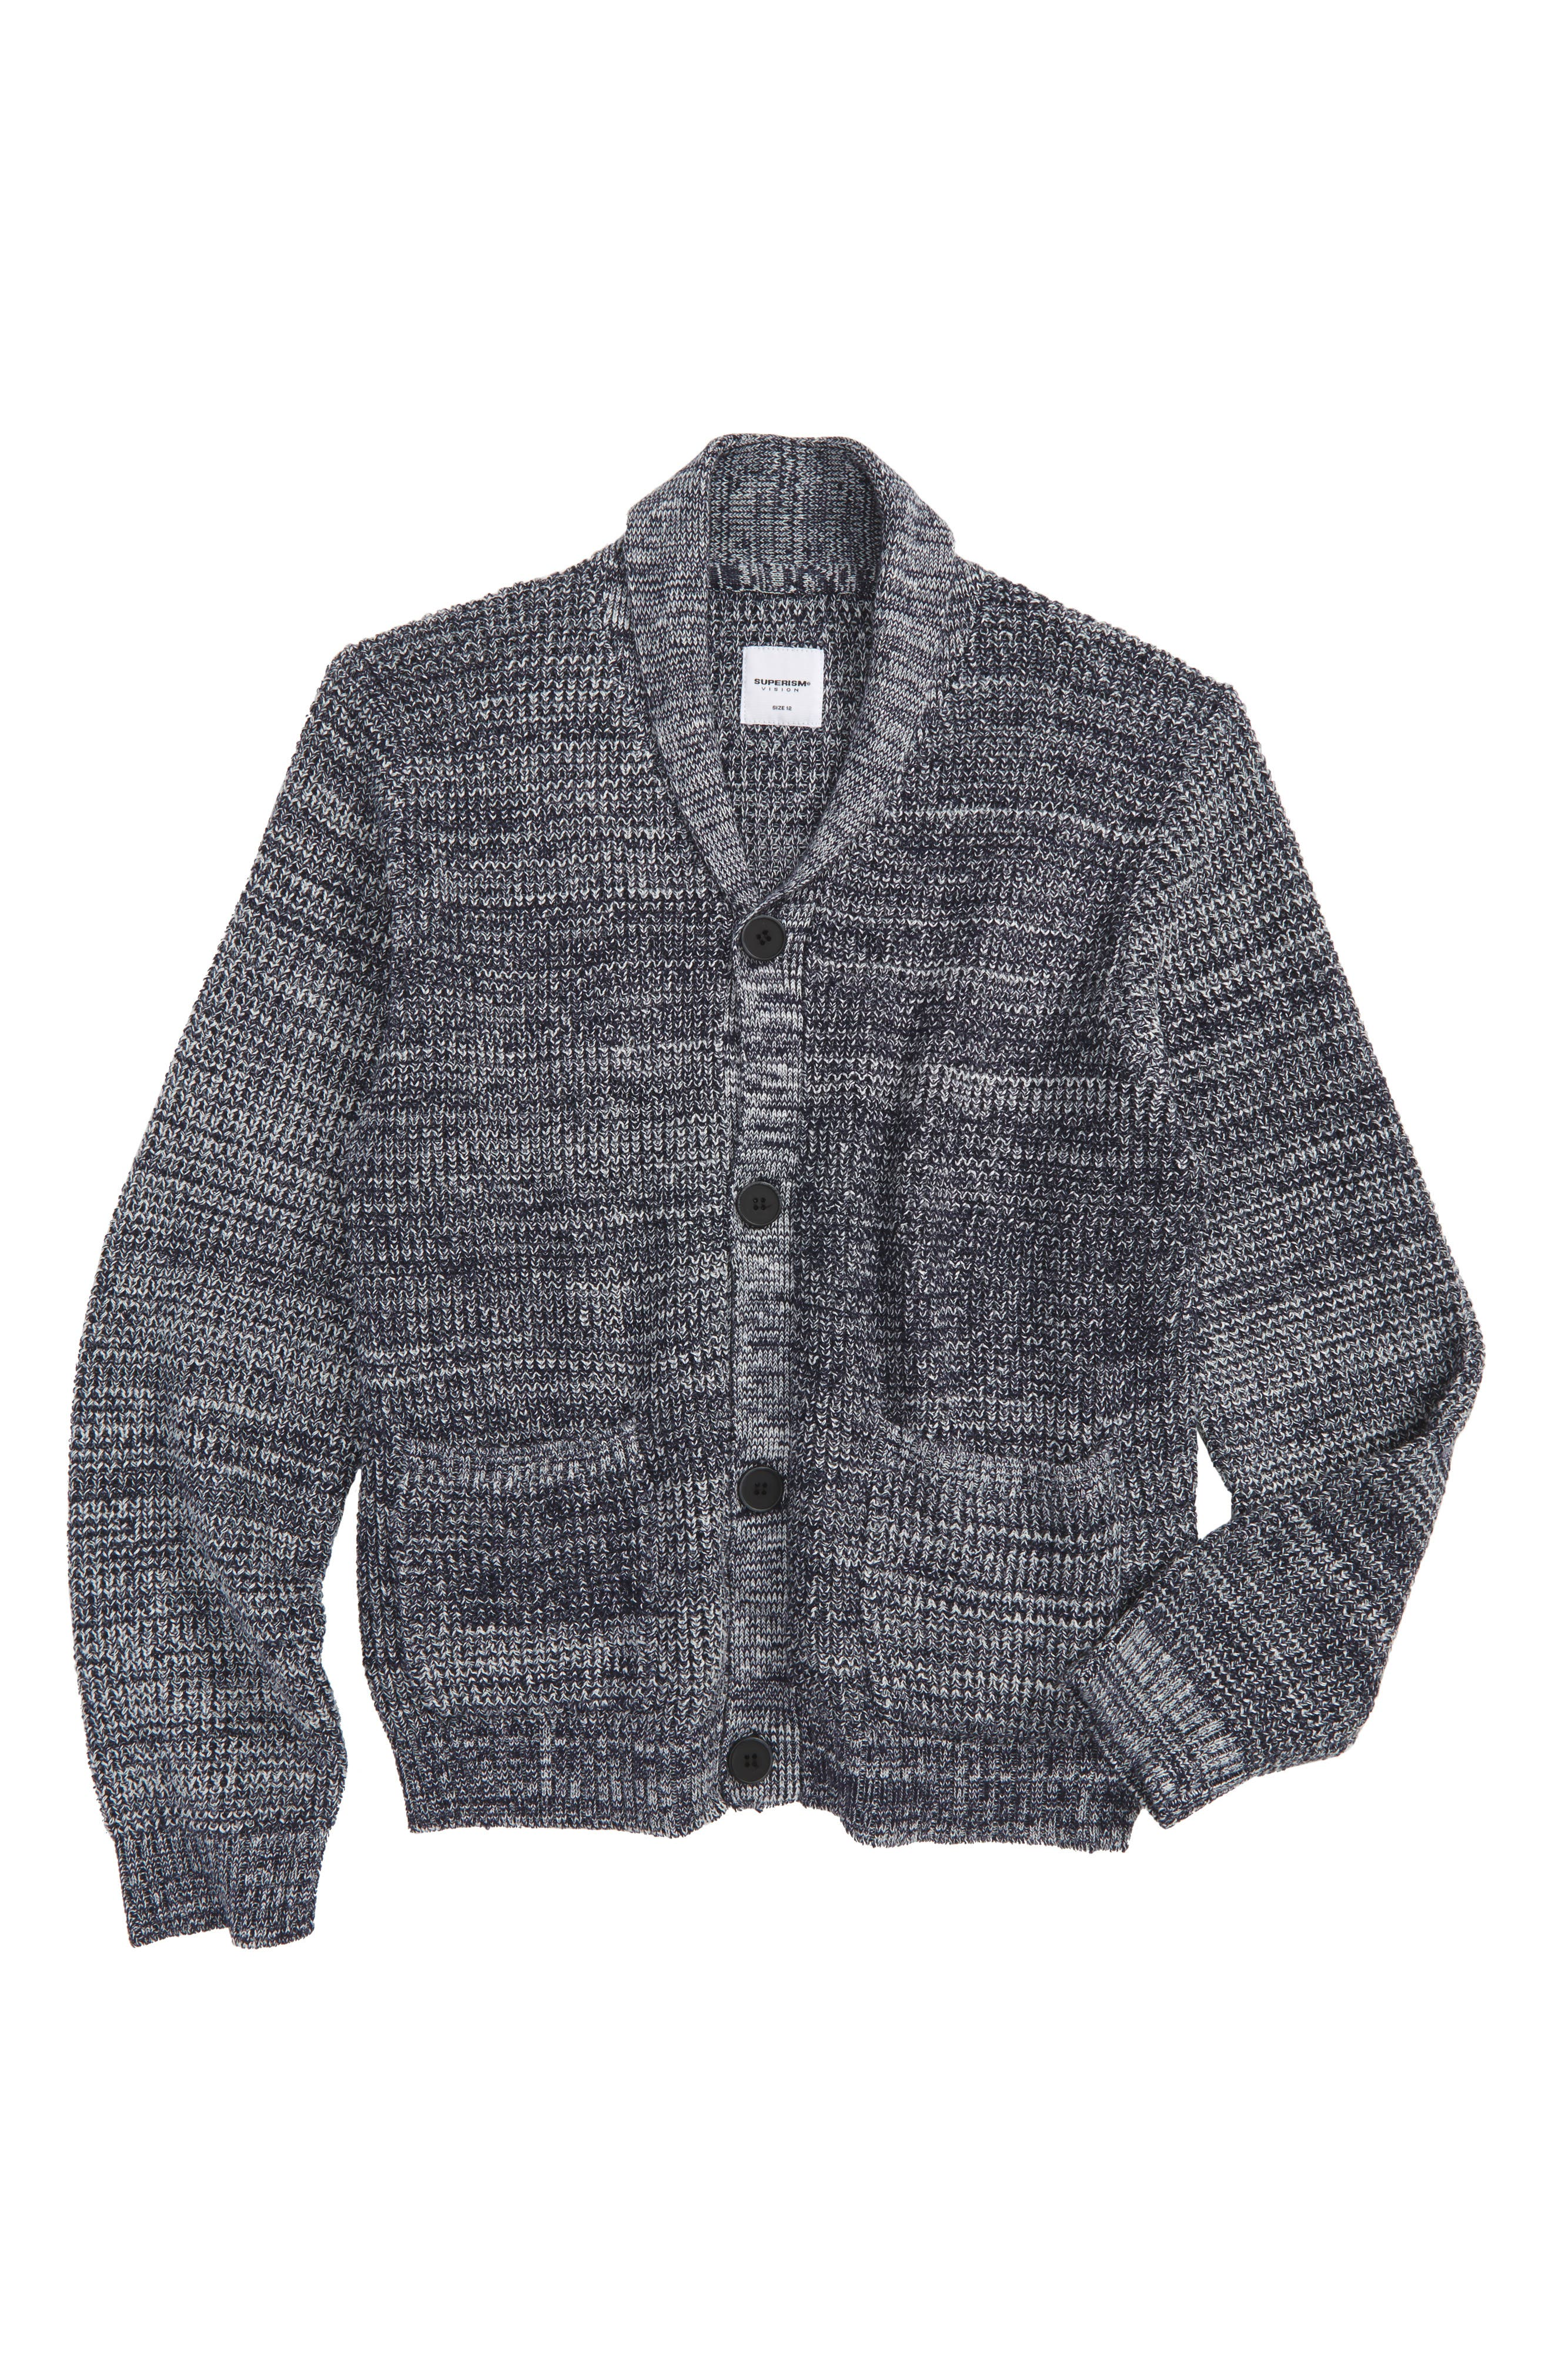 Cruz Cardigan Sweater,                         Main,                         color, 410